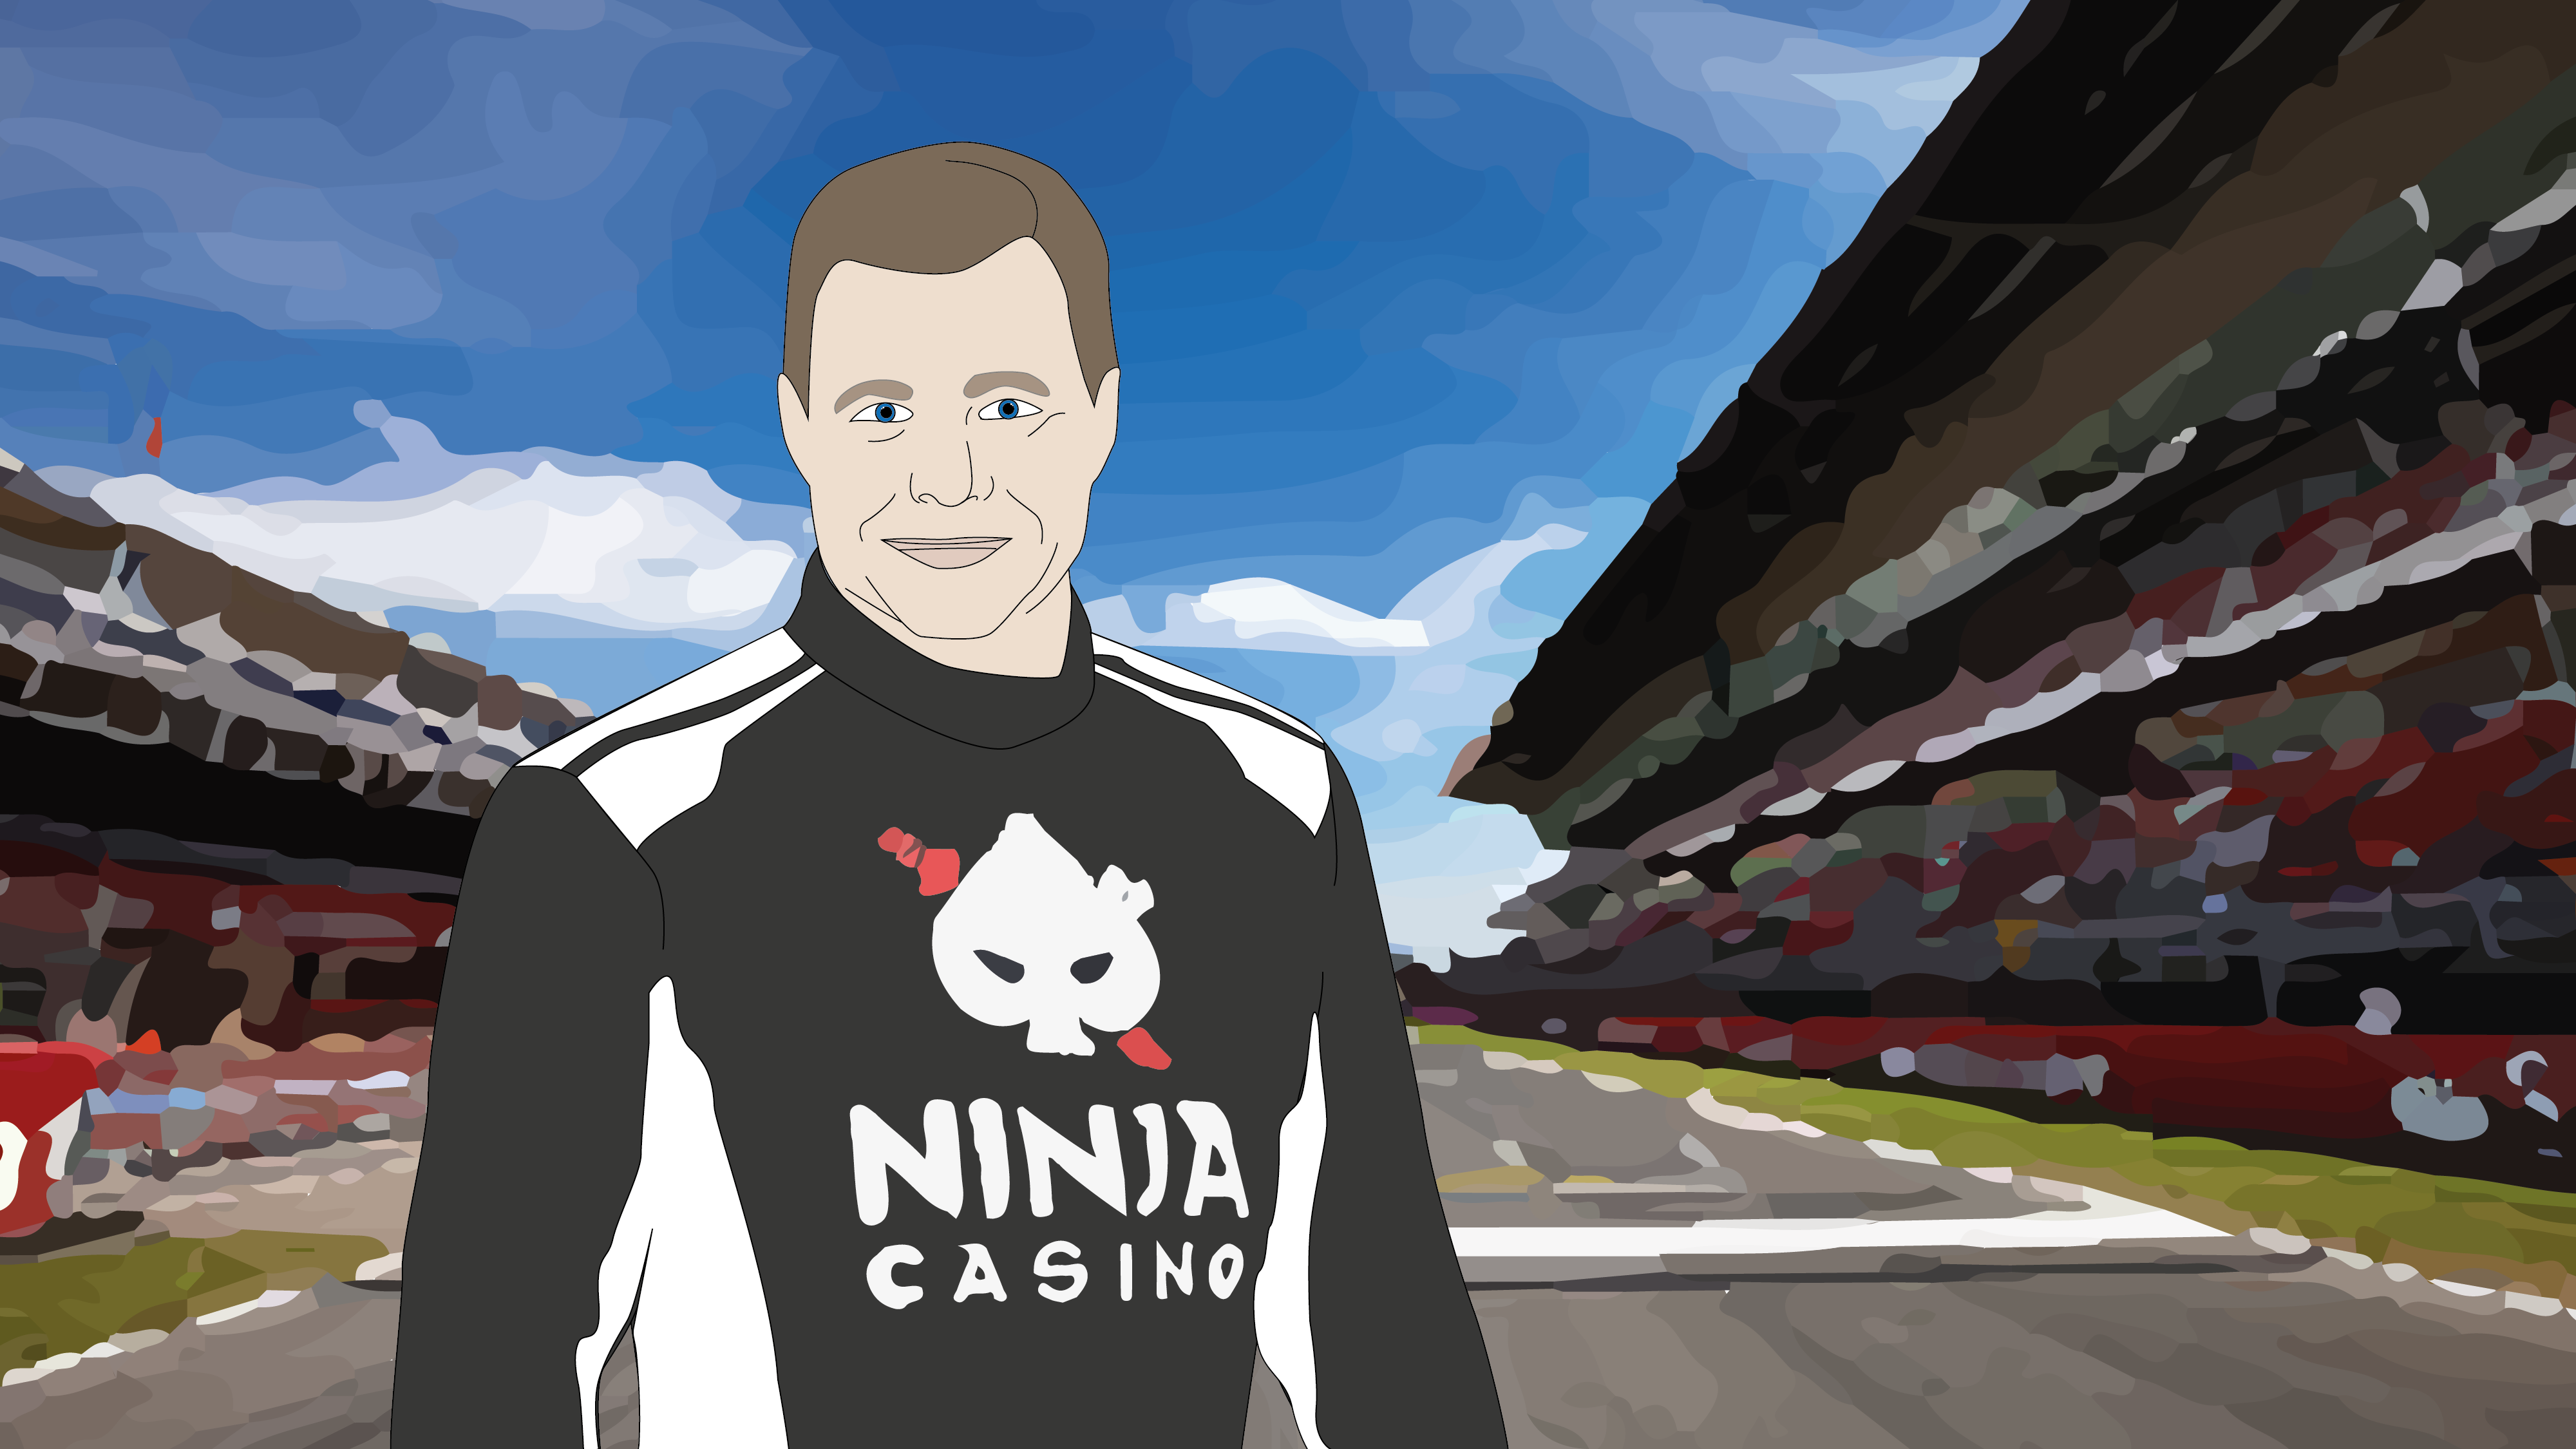 Ninja Casino Suomi ja Mika Salo